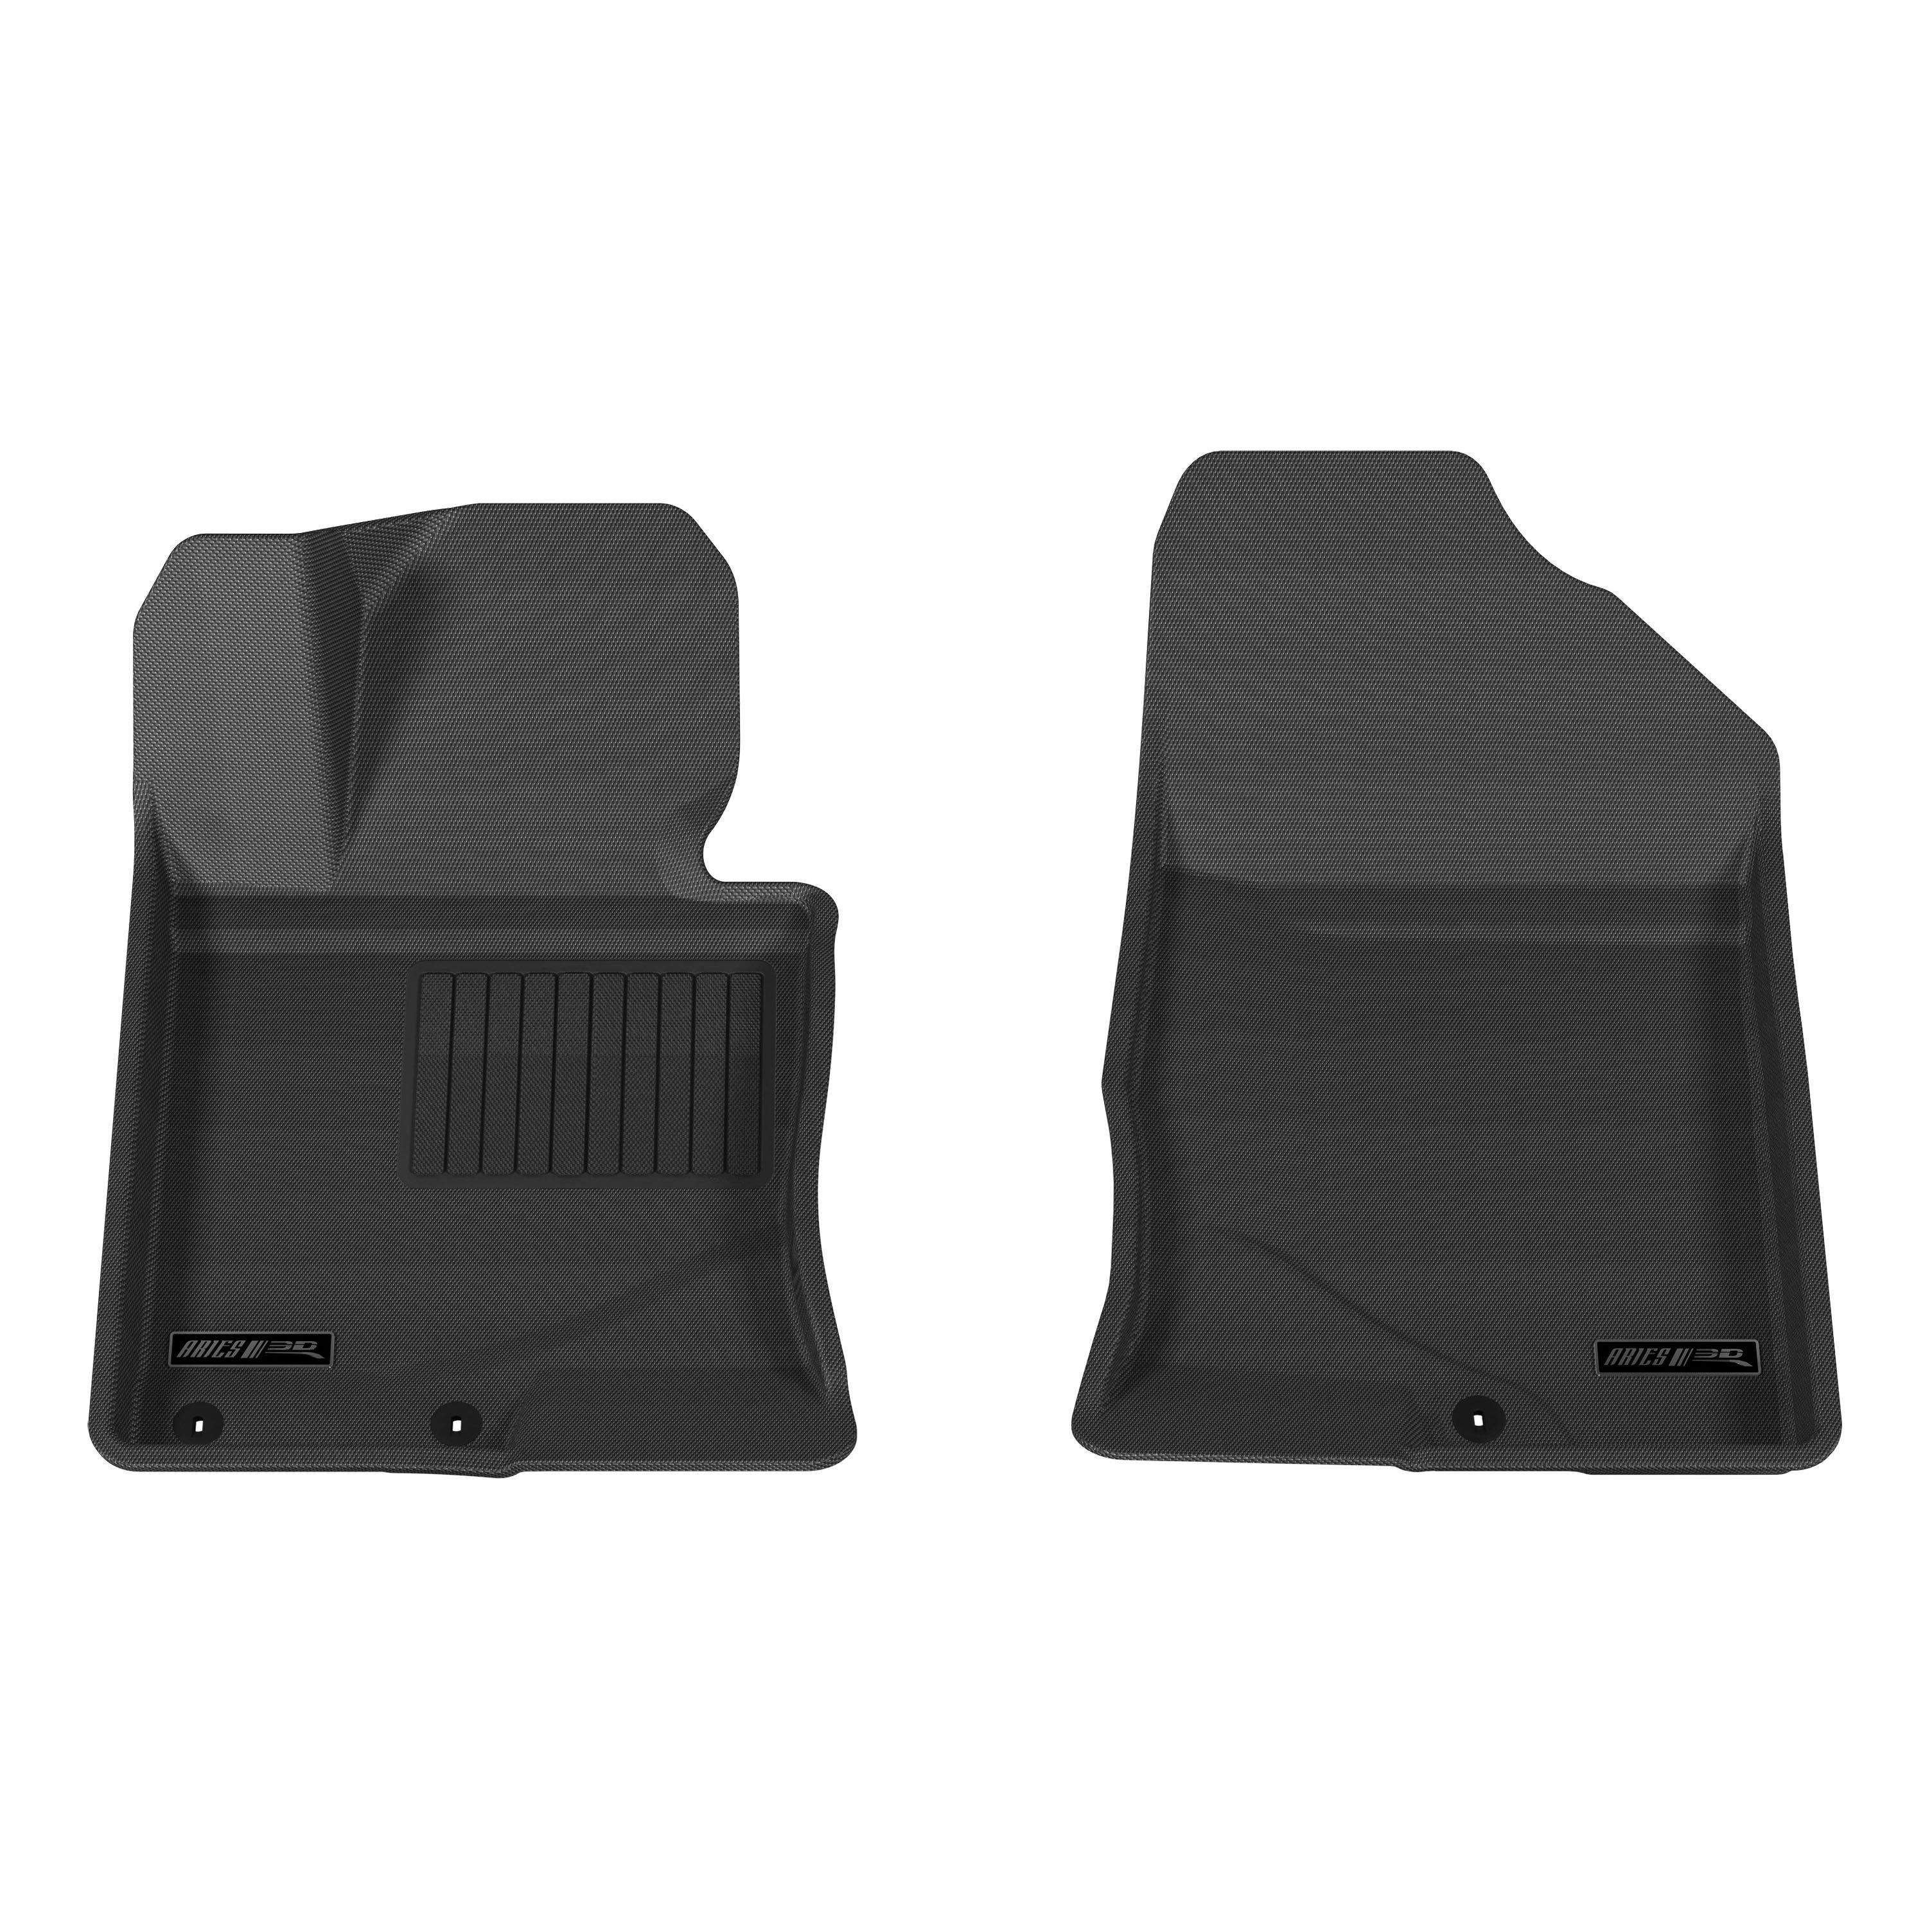 aries black floor mat liner set for 2011 2014 hyundai sonata ebay. Black Bedroom Furniture Sets. Home Design Ideas